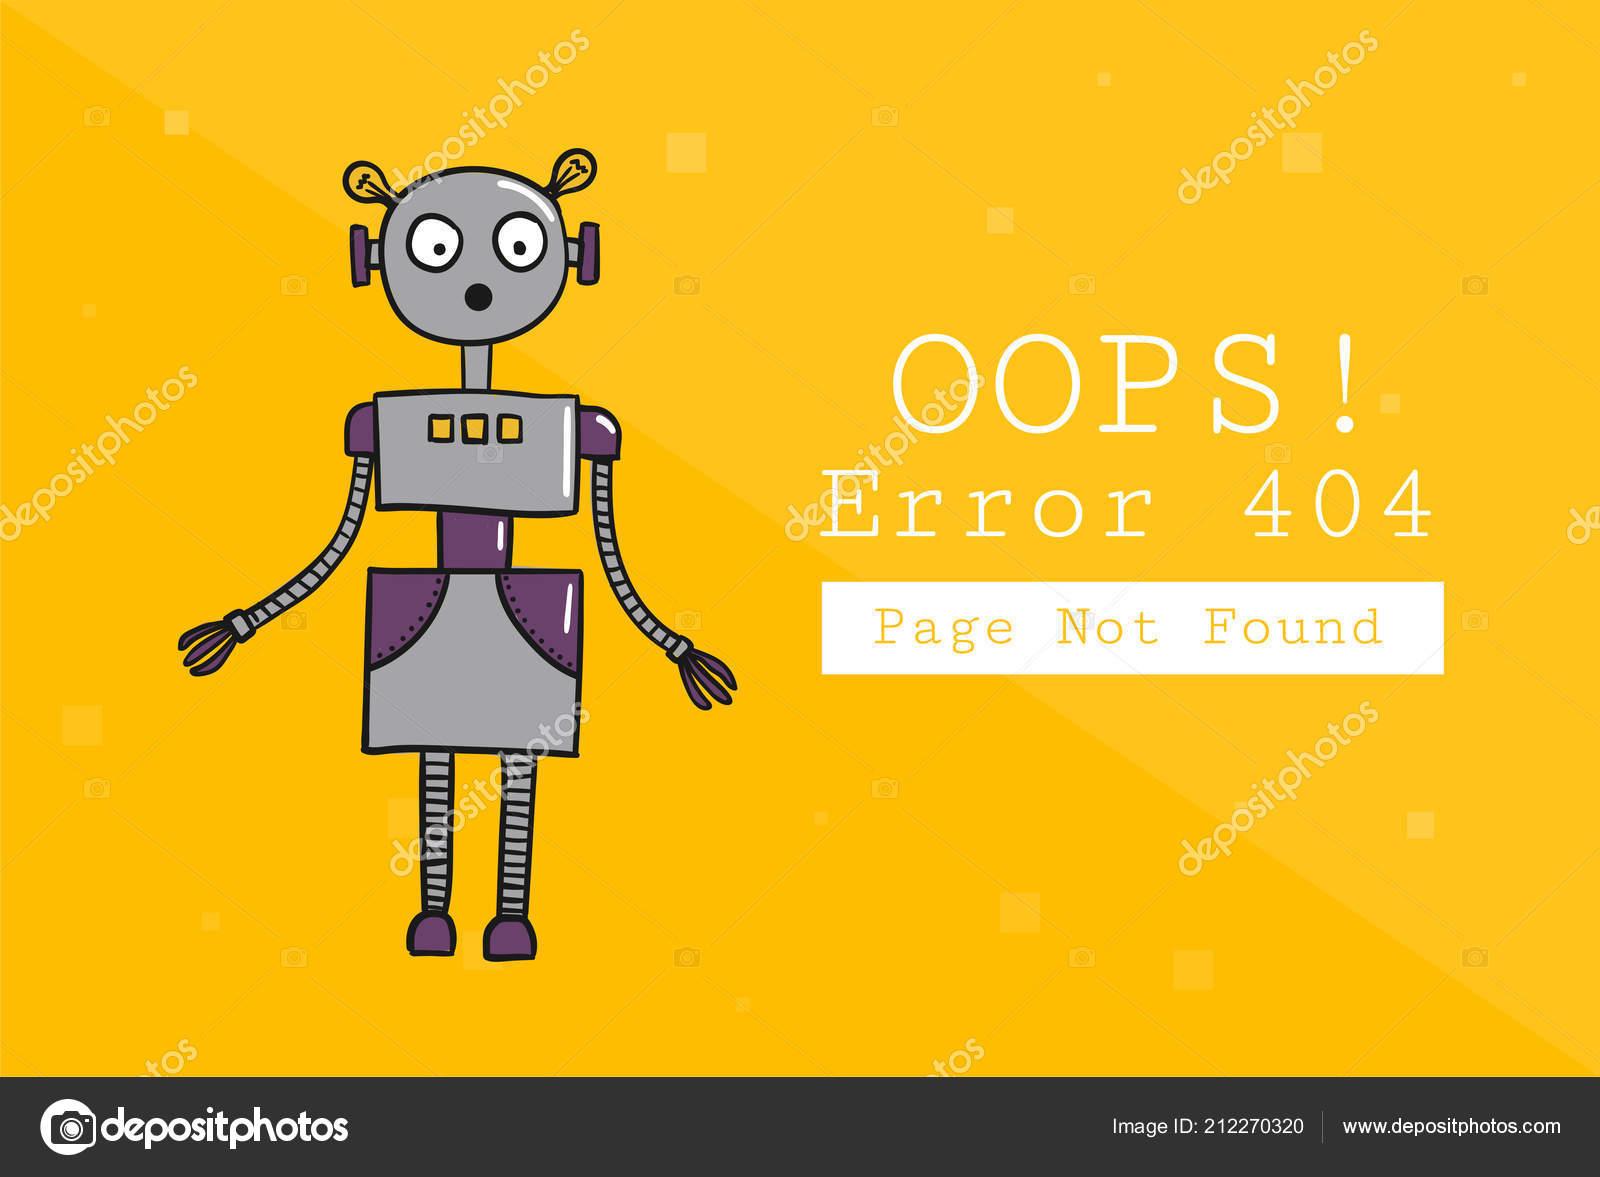 Error 404 Page Found Design Template Text Robot Illustration